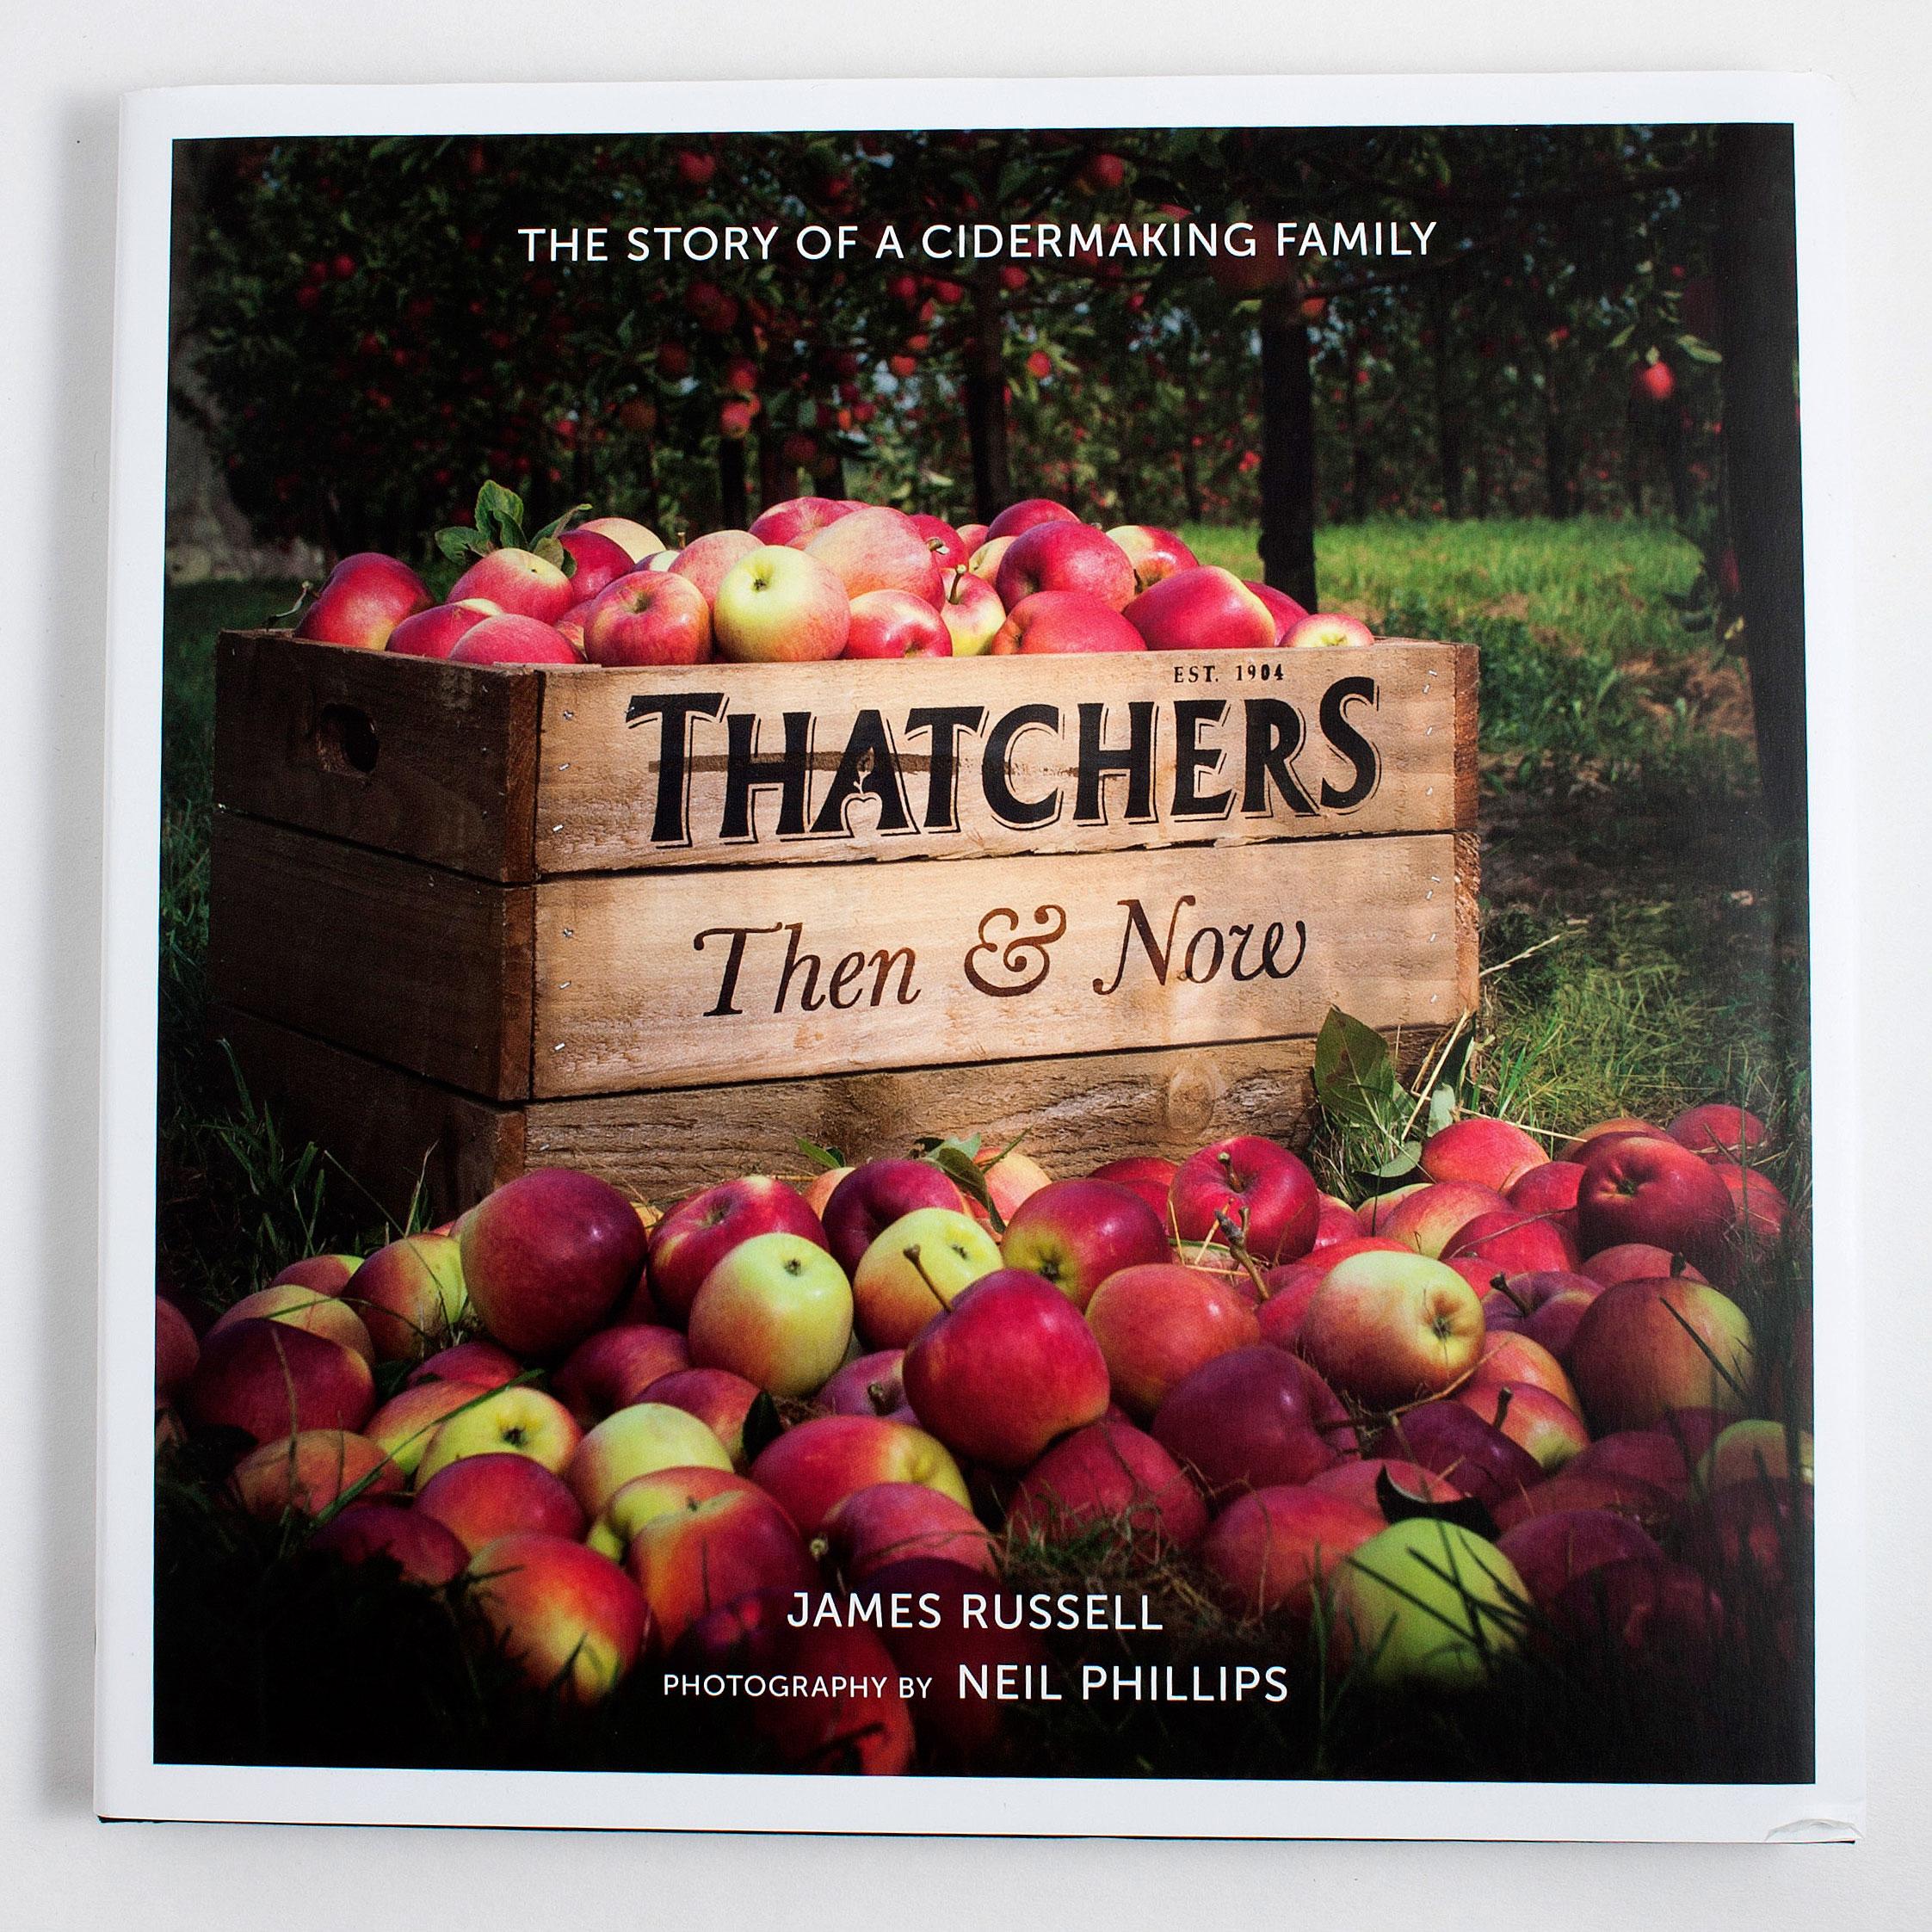 epm-print-management-bristol-food-books-thatchers-3.jpg